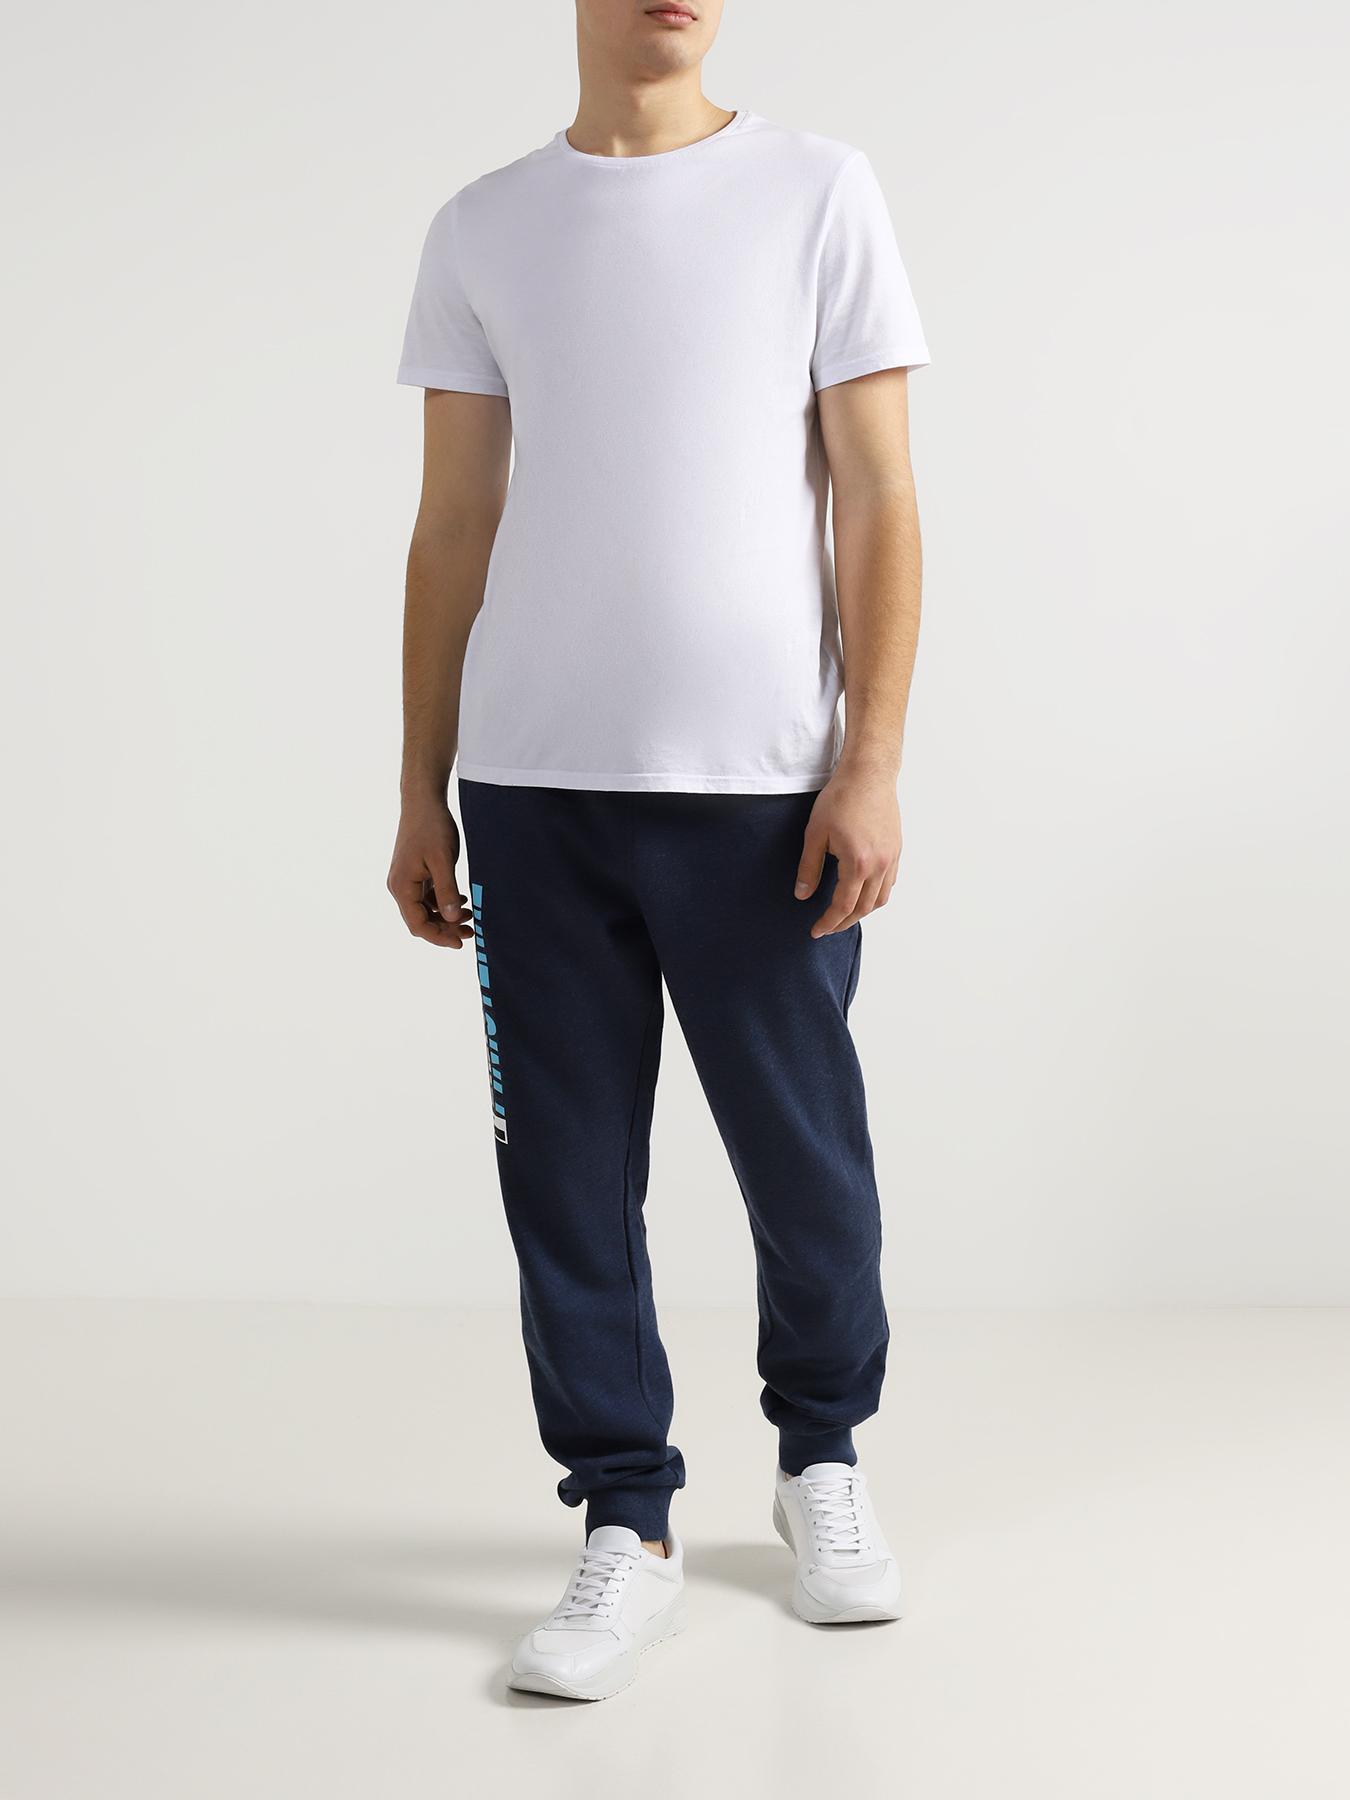 Брюки Finisterre Спортивные брюки брюки спортивные columbia columbia anytime outdoor boot cut pant